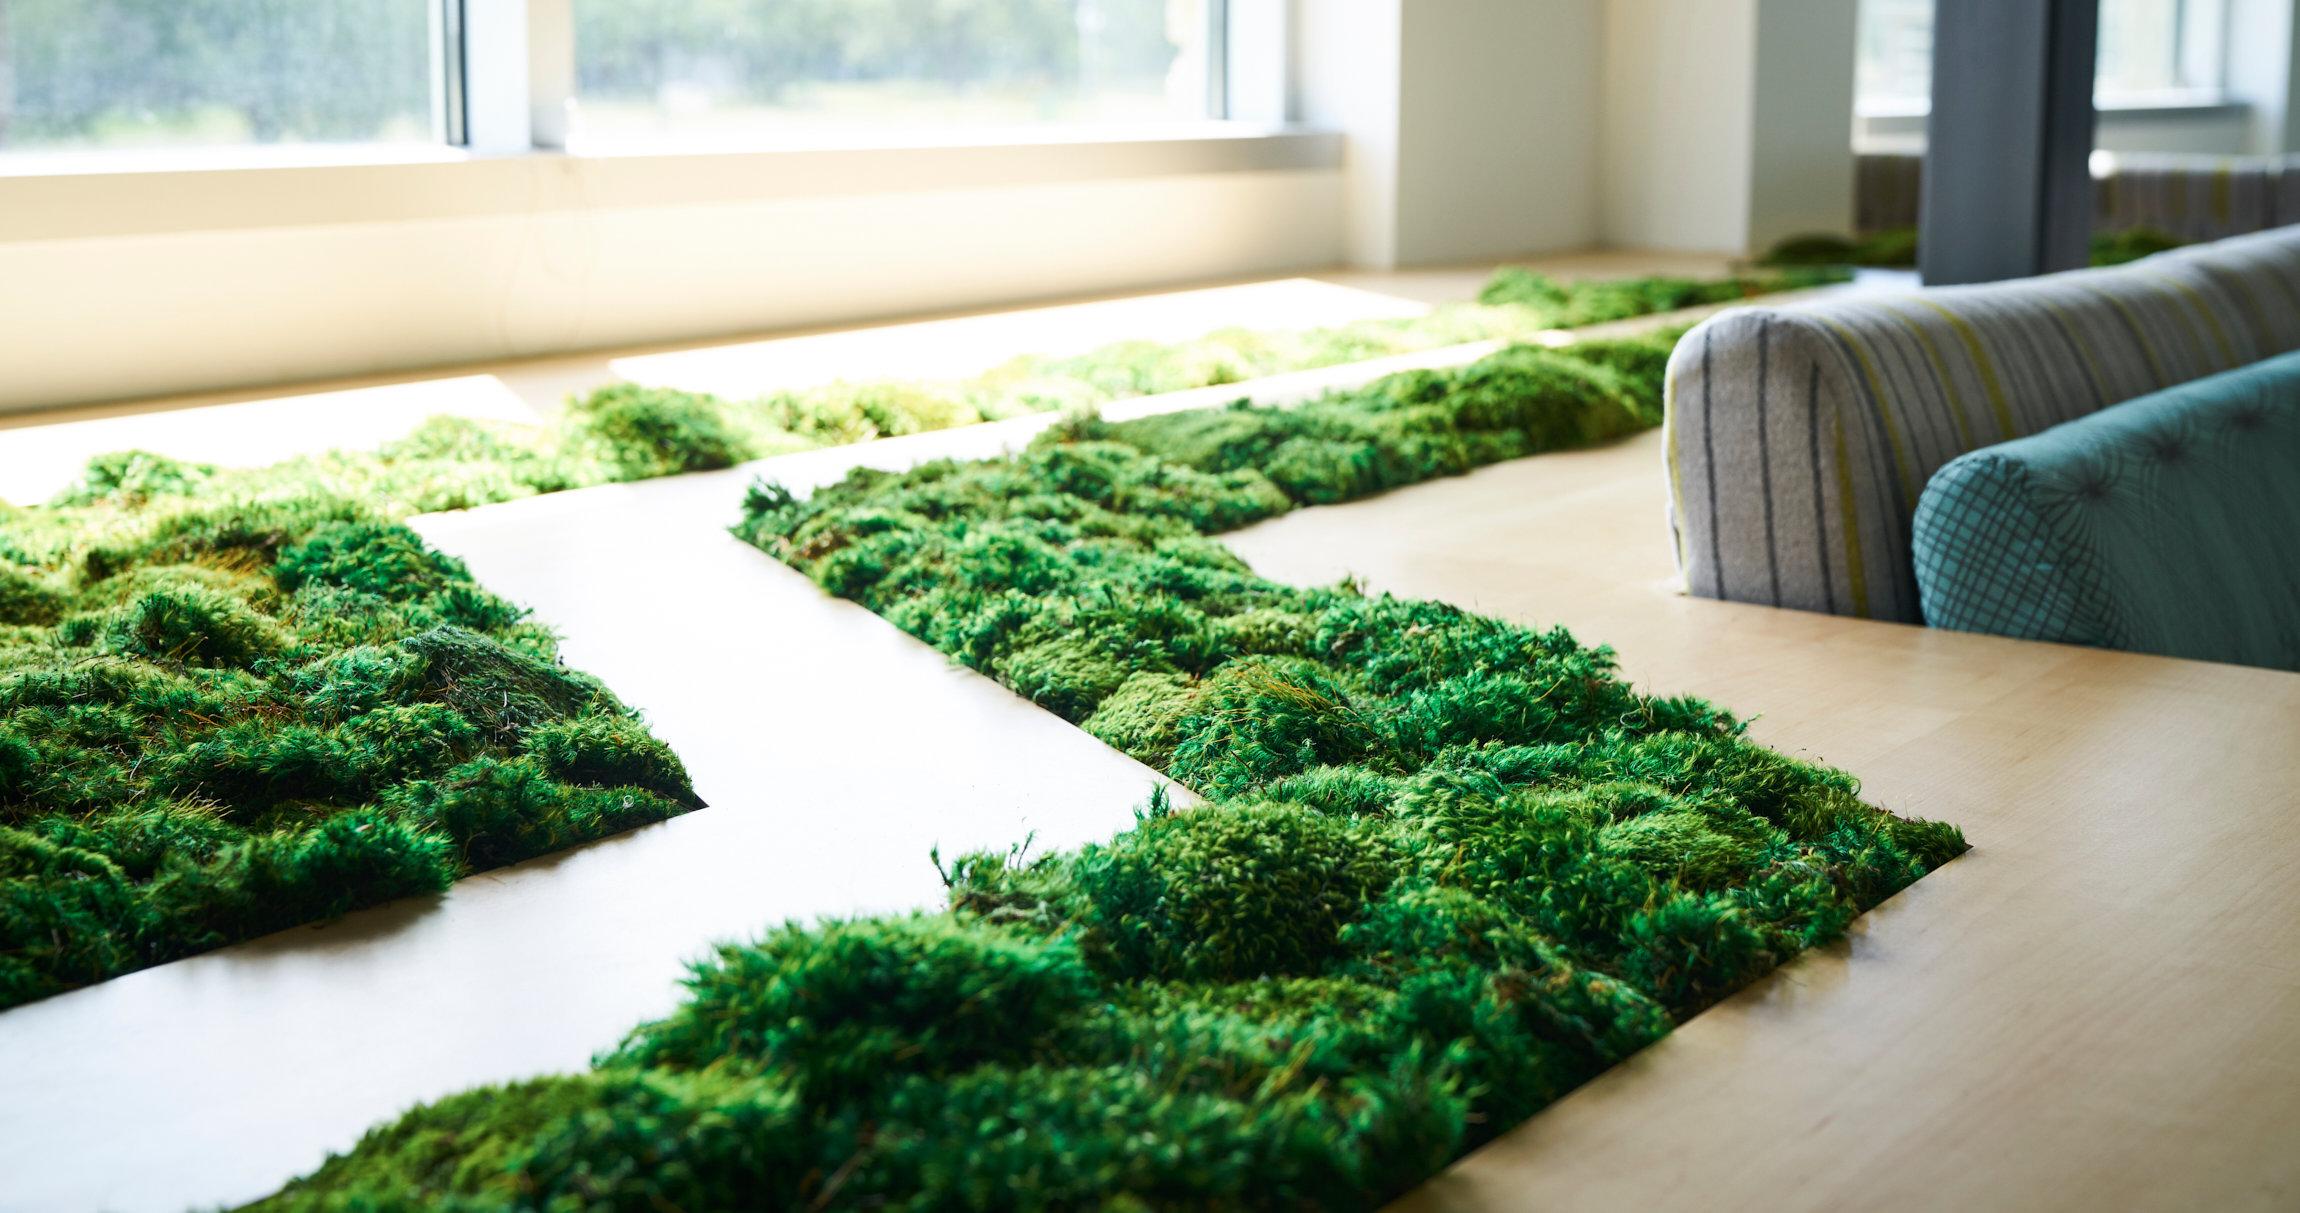 seatgrassdetail2.jpg